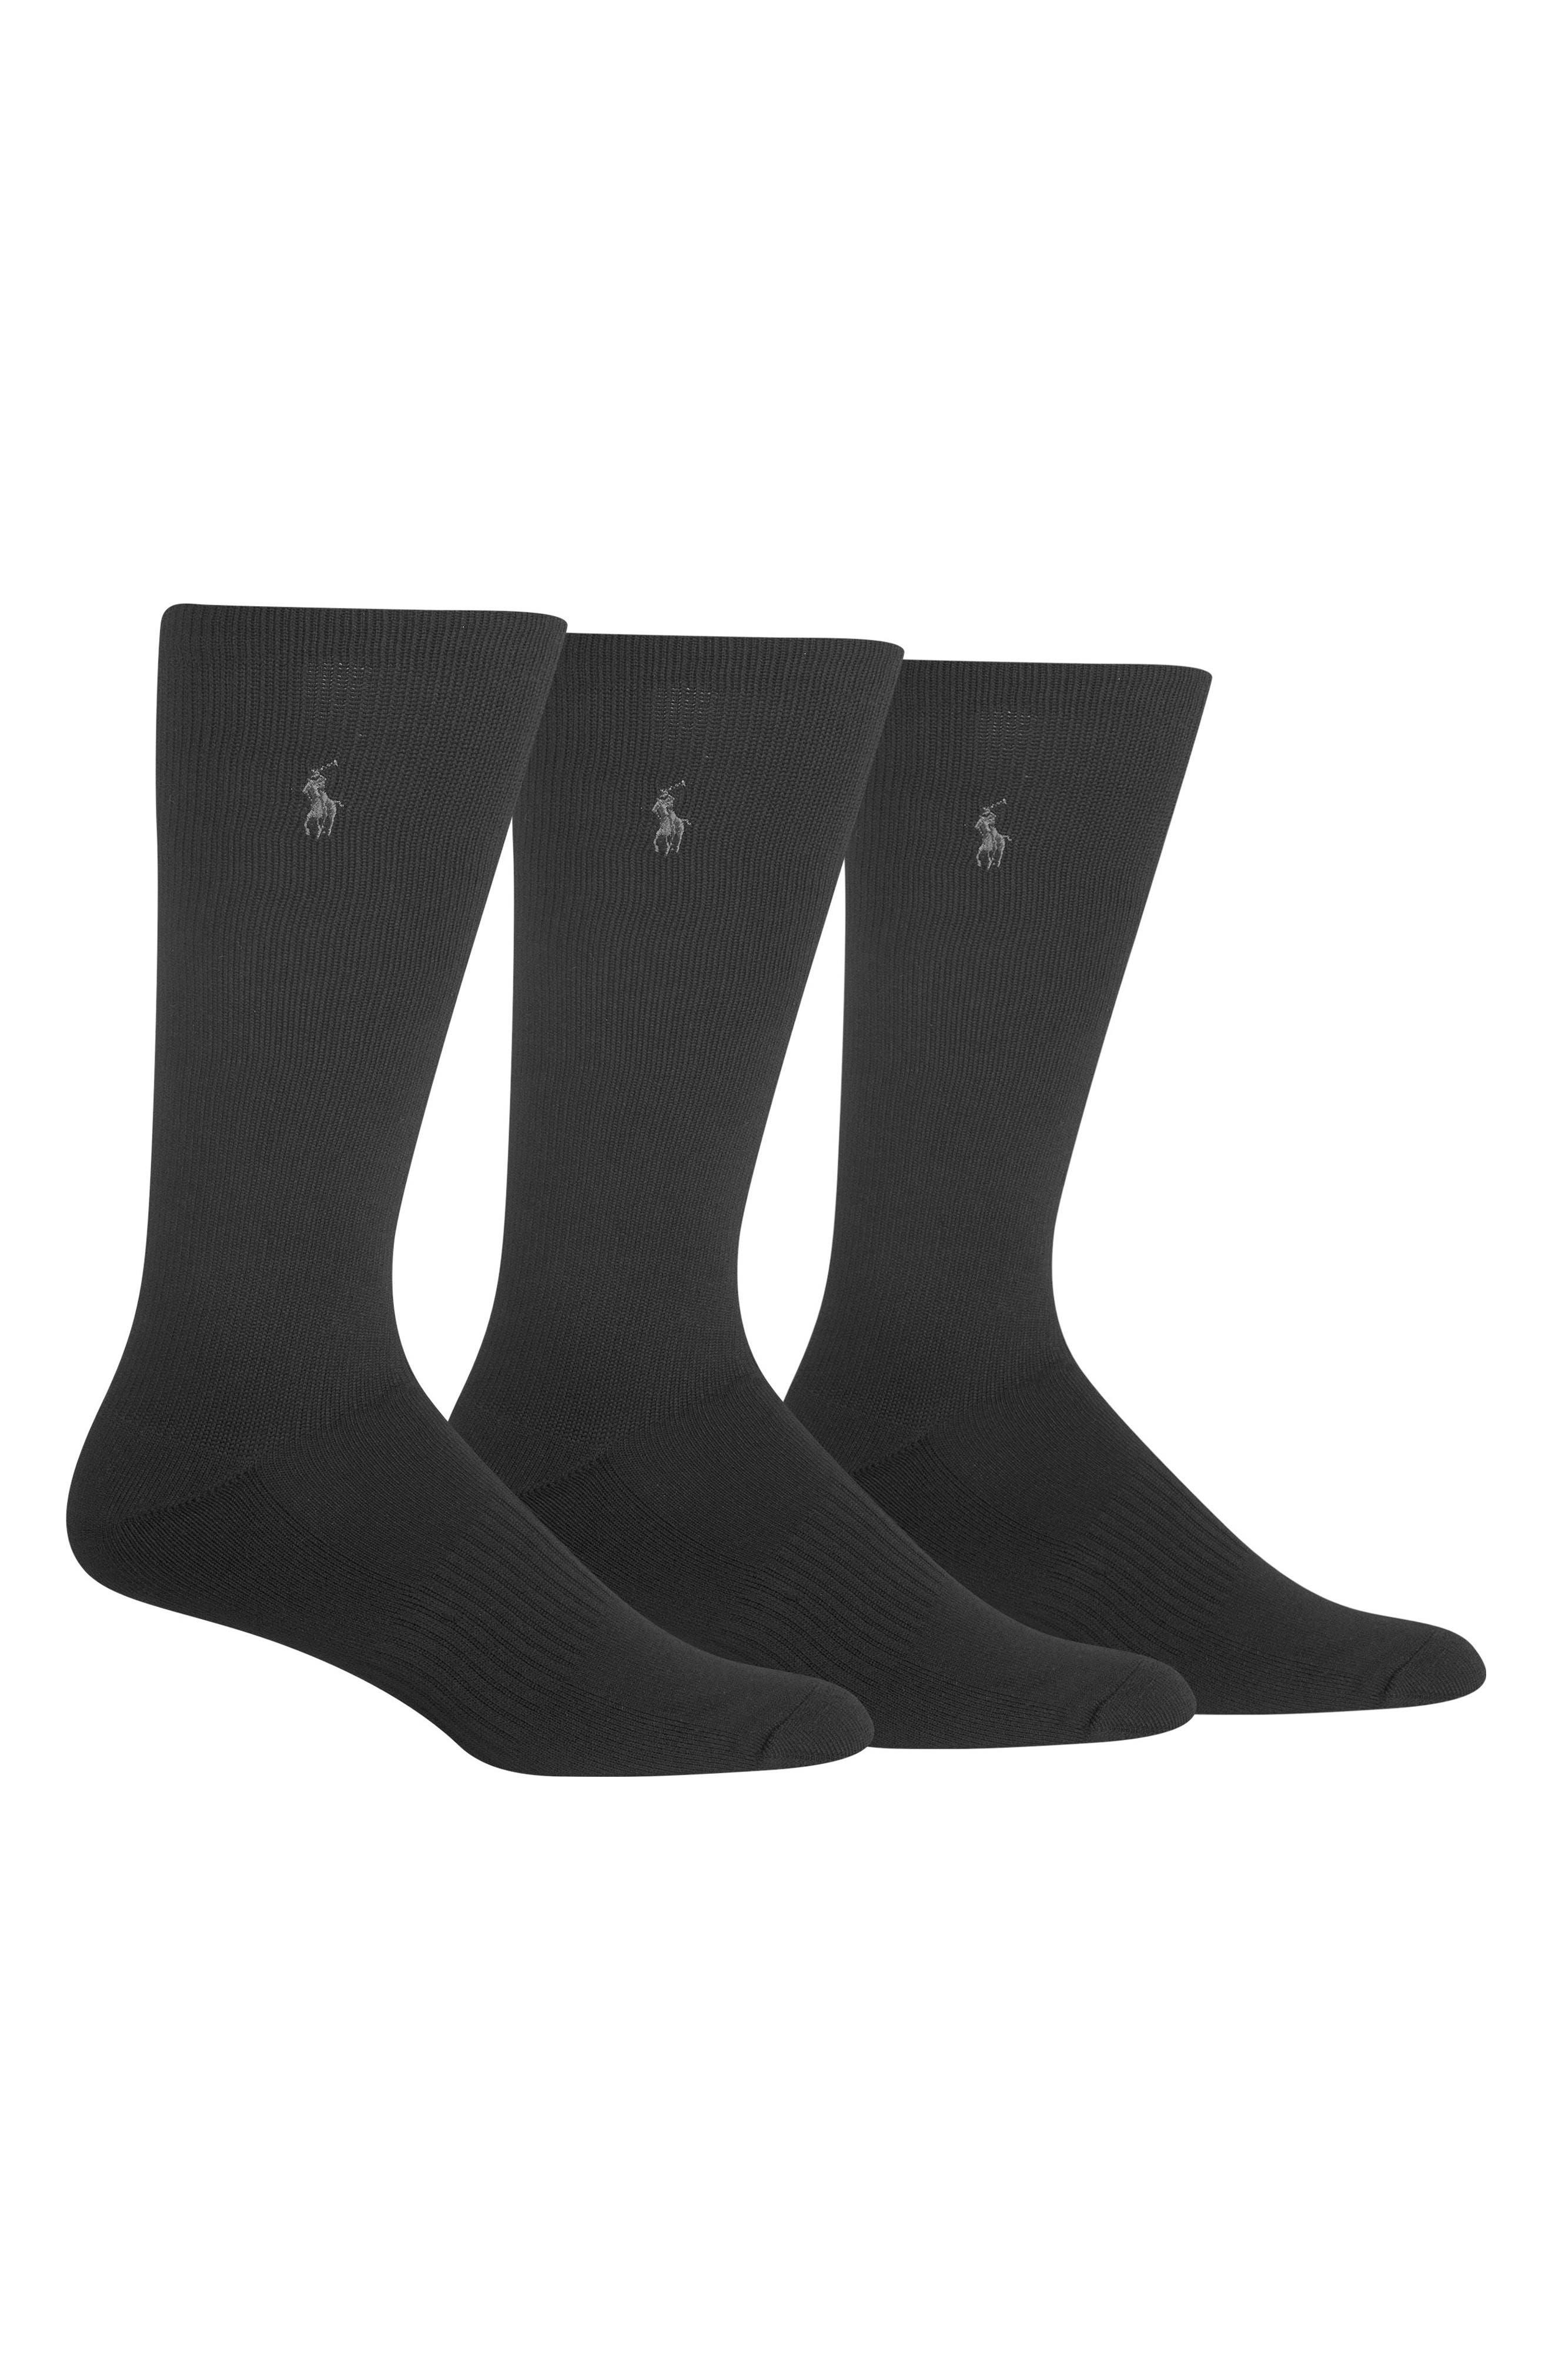 3-Pack Compression Socks,                             Main thumbnail 1, color,                             001